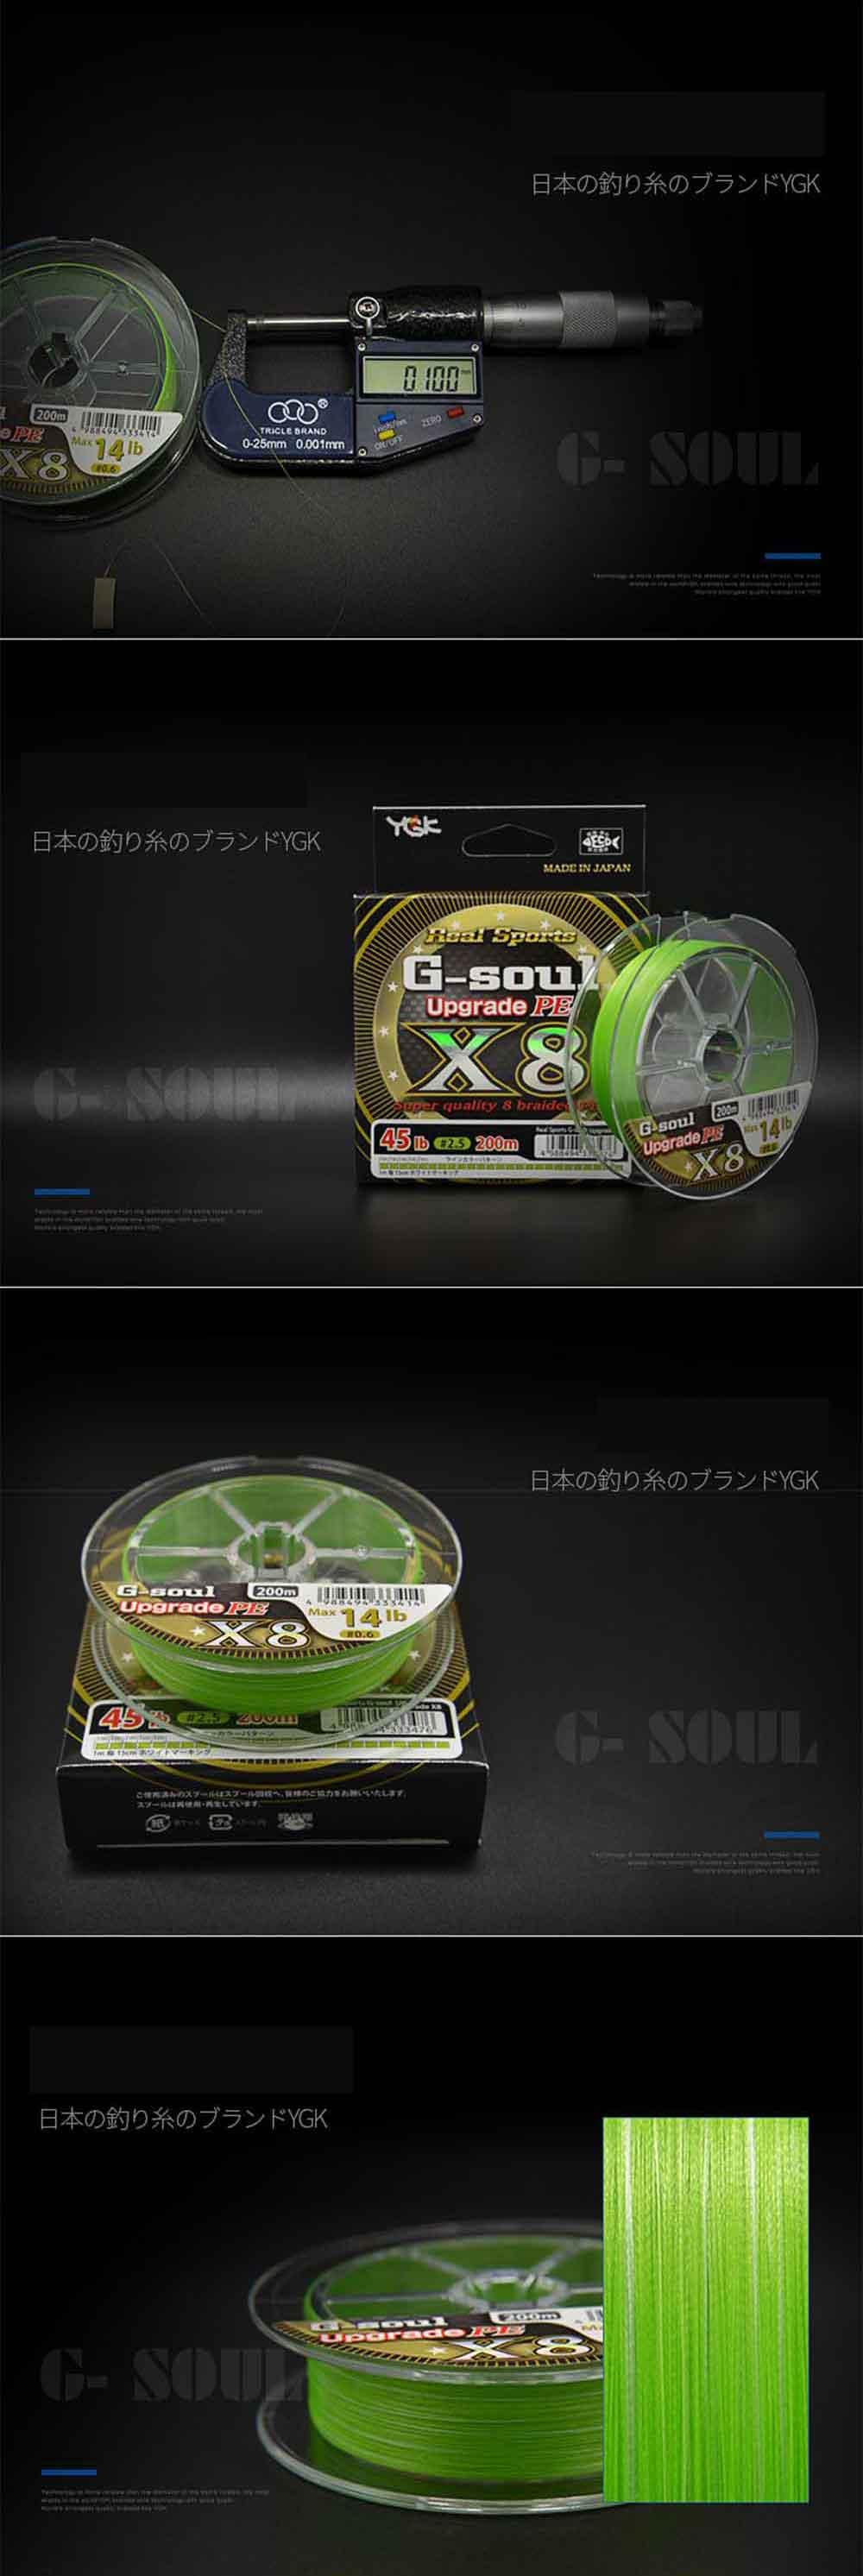 YGK G-Soul X8 Upgrade 22lb #1.0-200m PE 8 Braid Green Line Japan